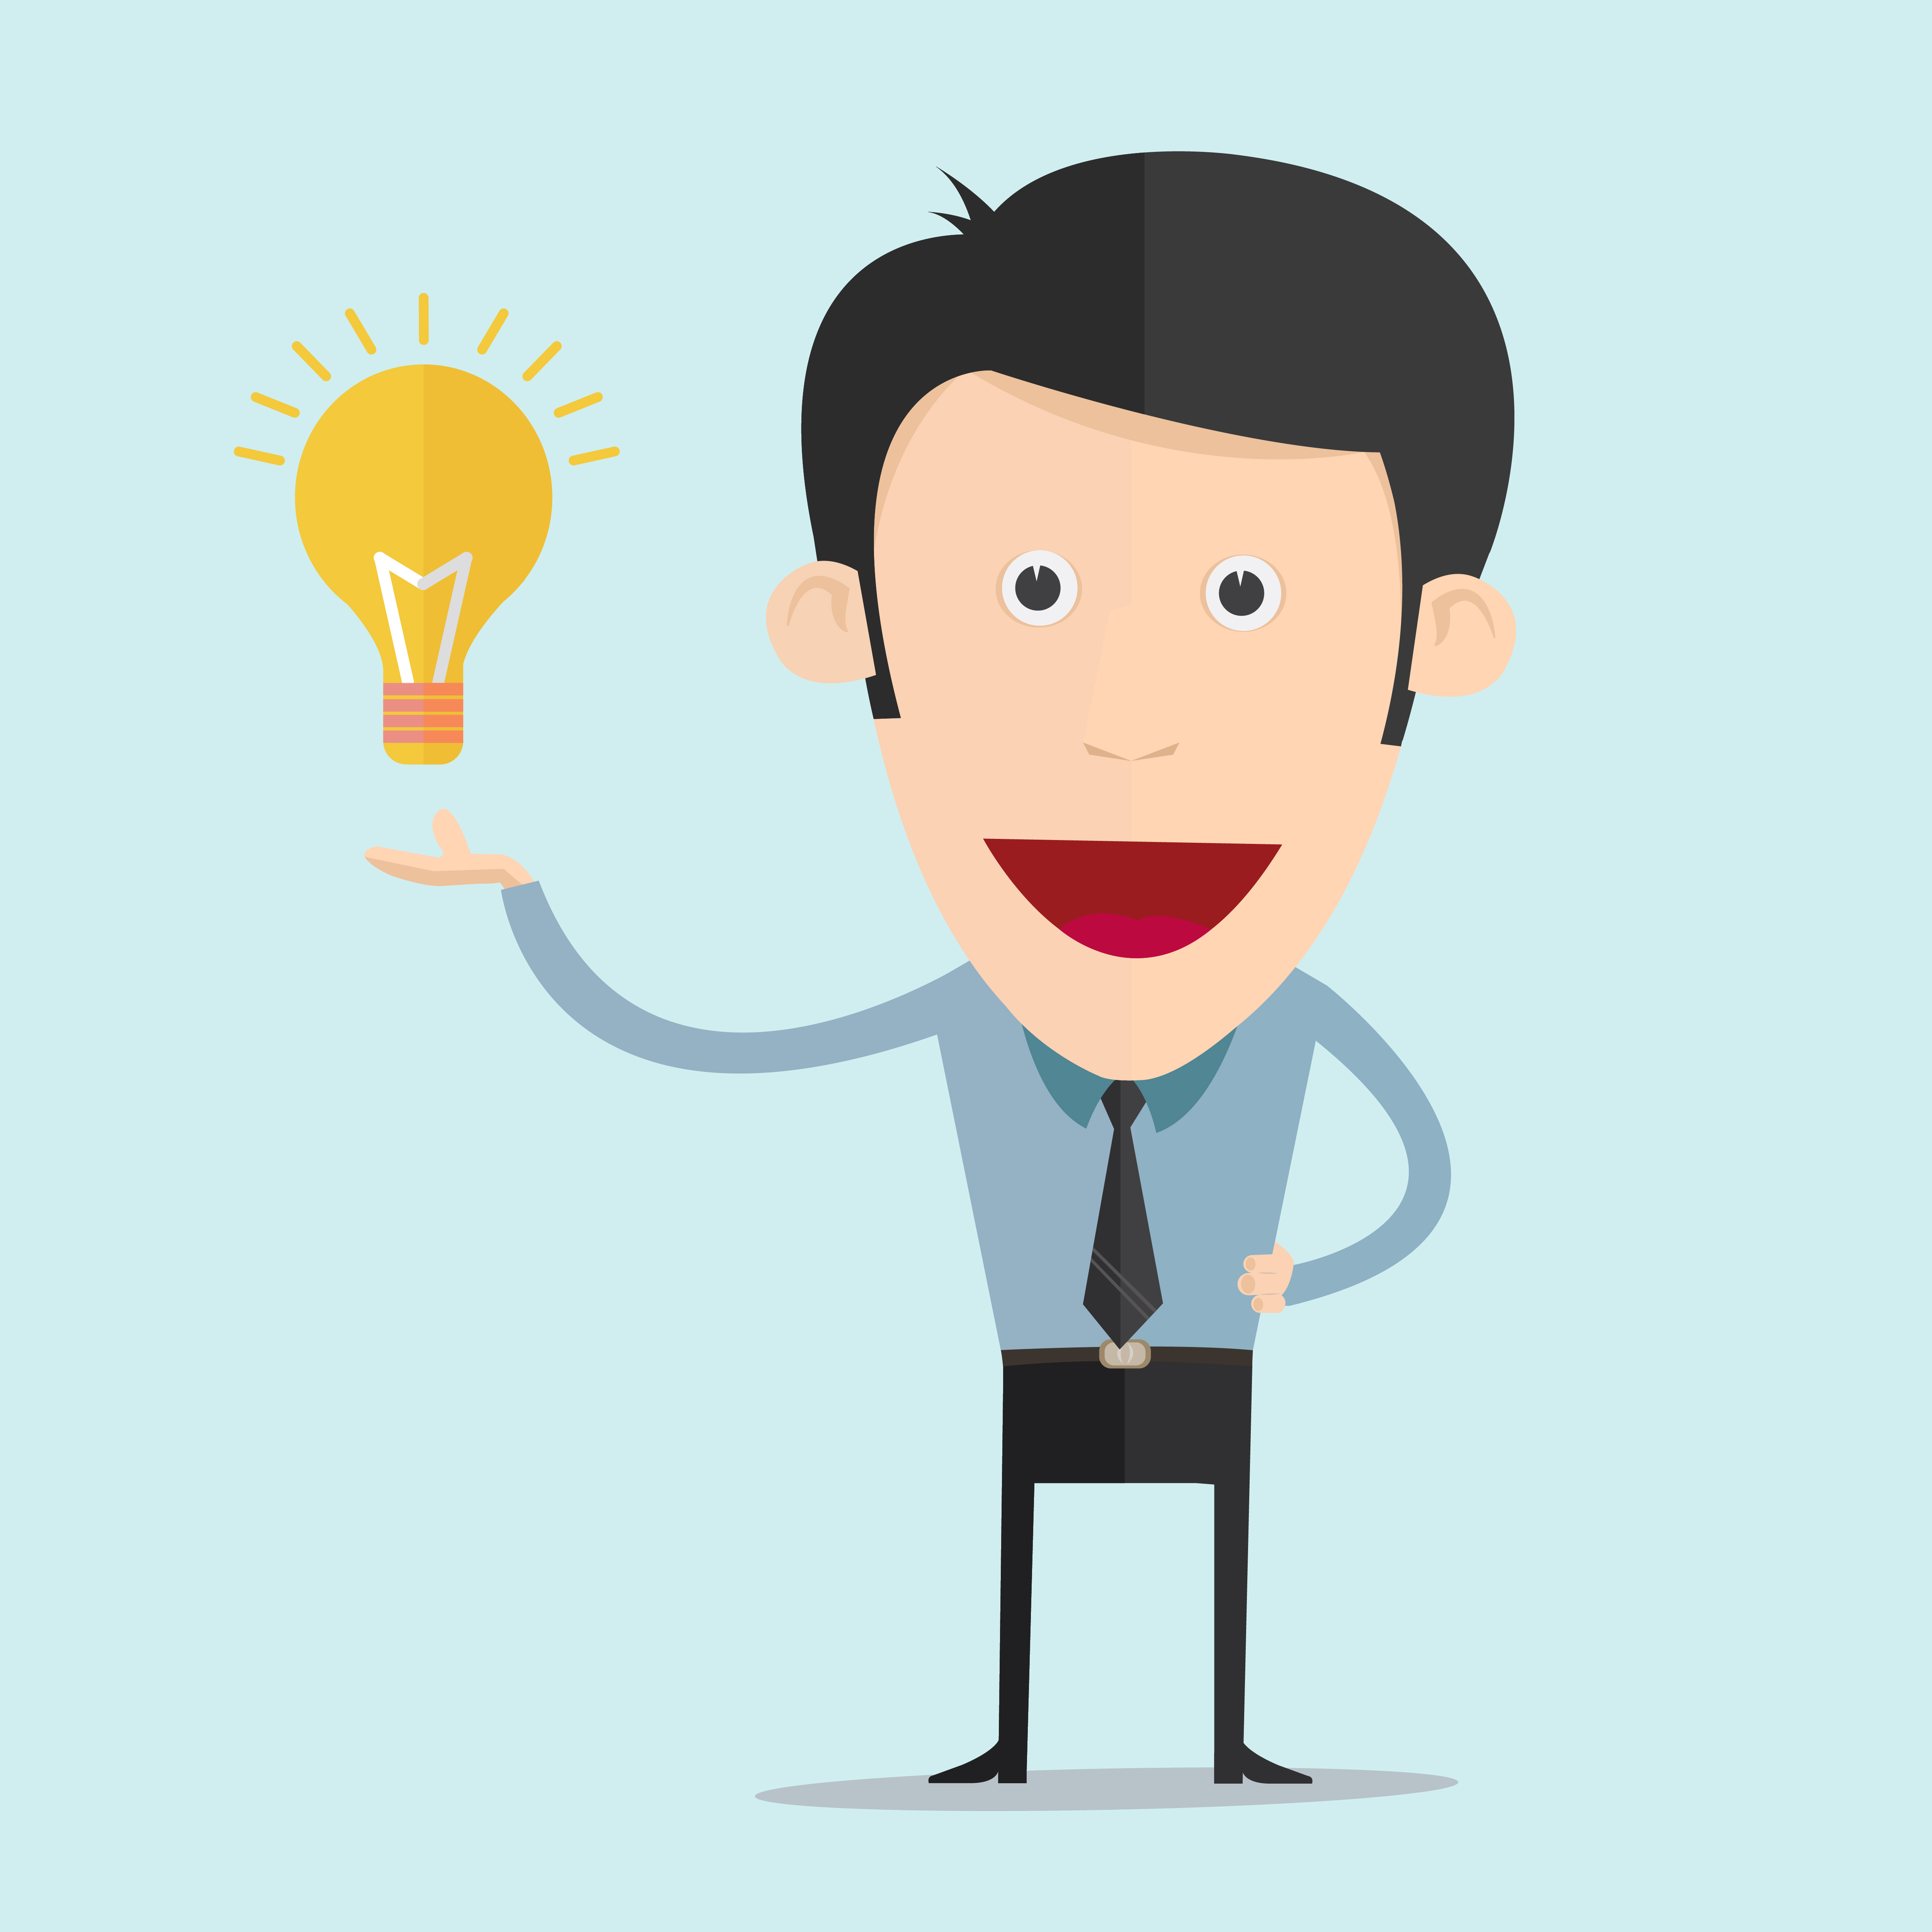 cartoon-image-customer-with-an-idea